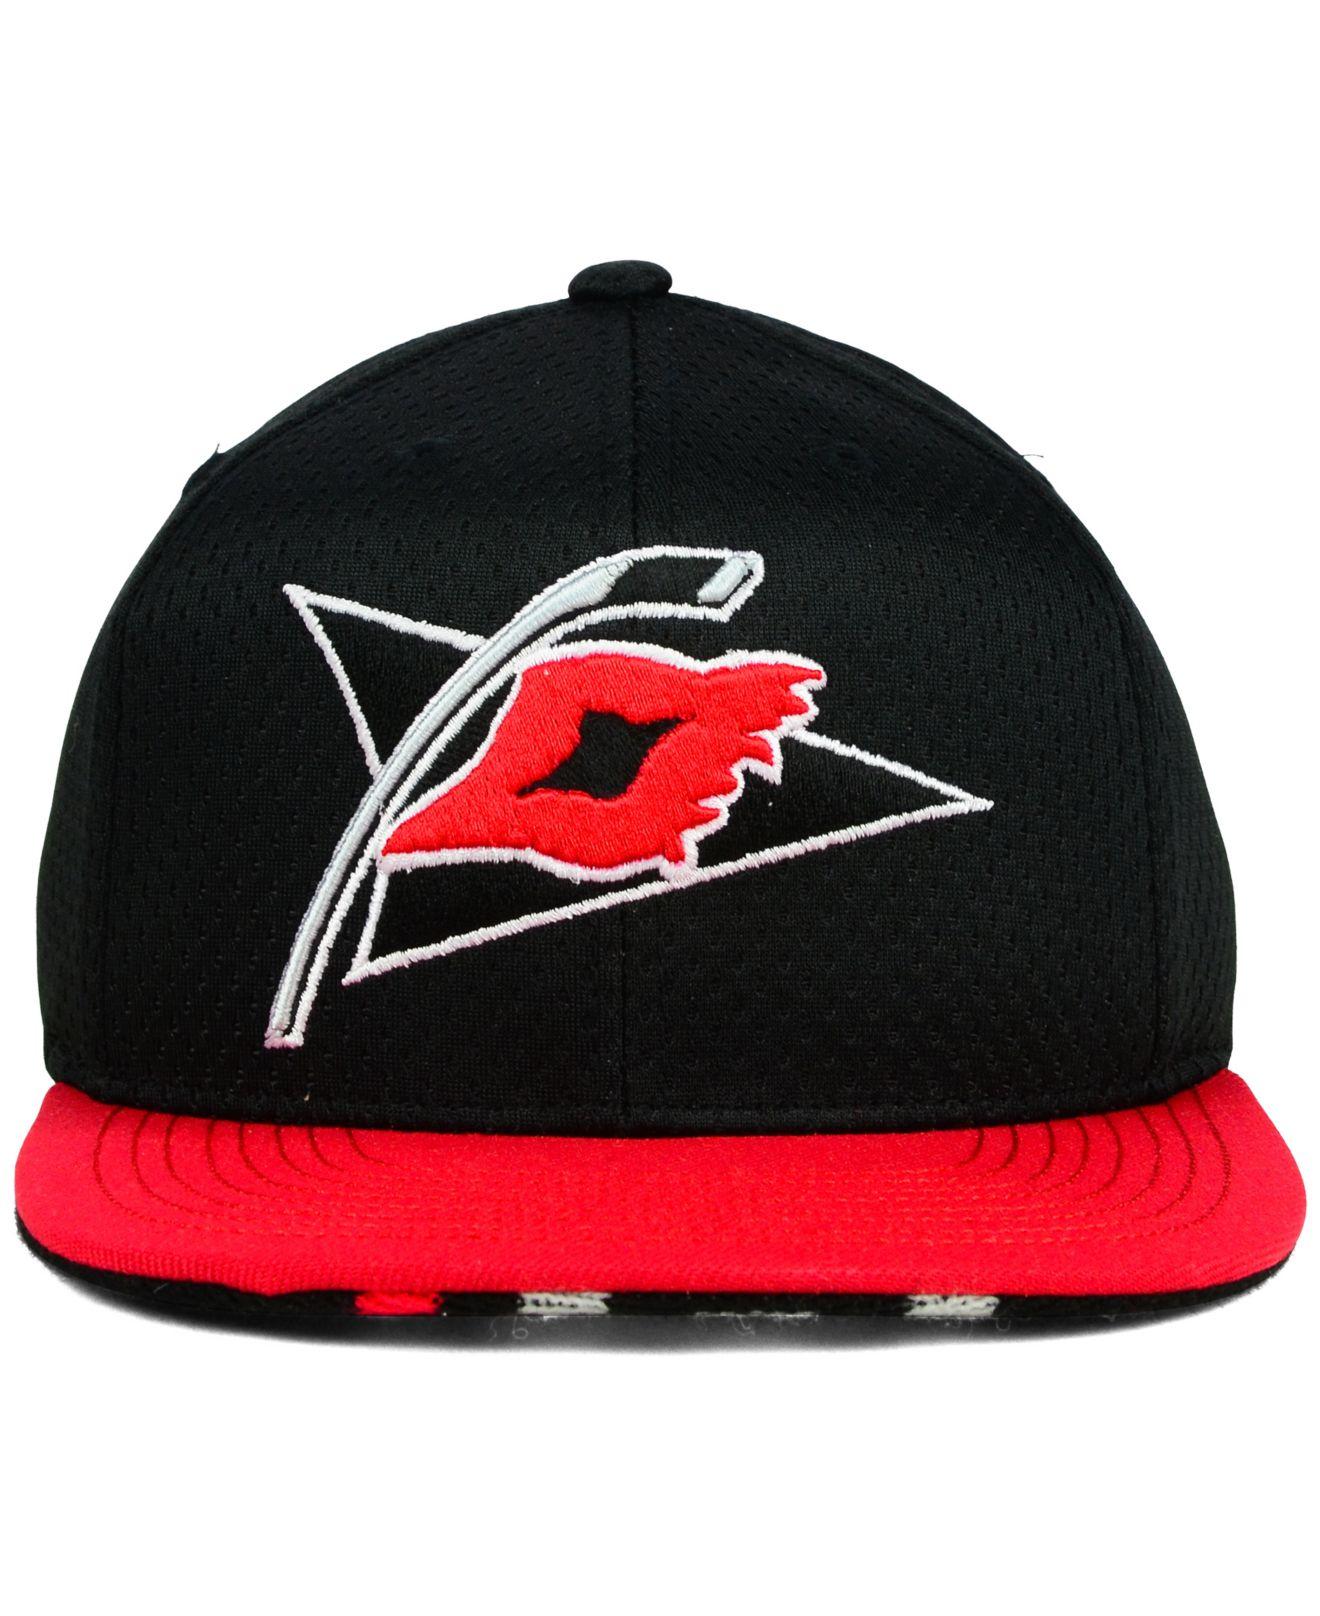 new styles fbeb8 da9d0 ... adjustable hat 5bc34 shop lyst reebok carolina hurricanes jersey hook  snapback cap in black 07f16 d2351 ...